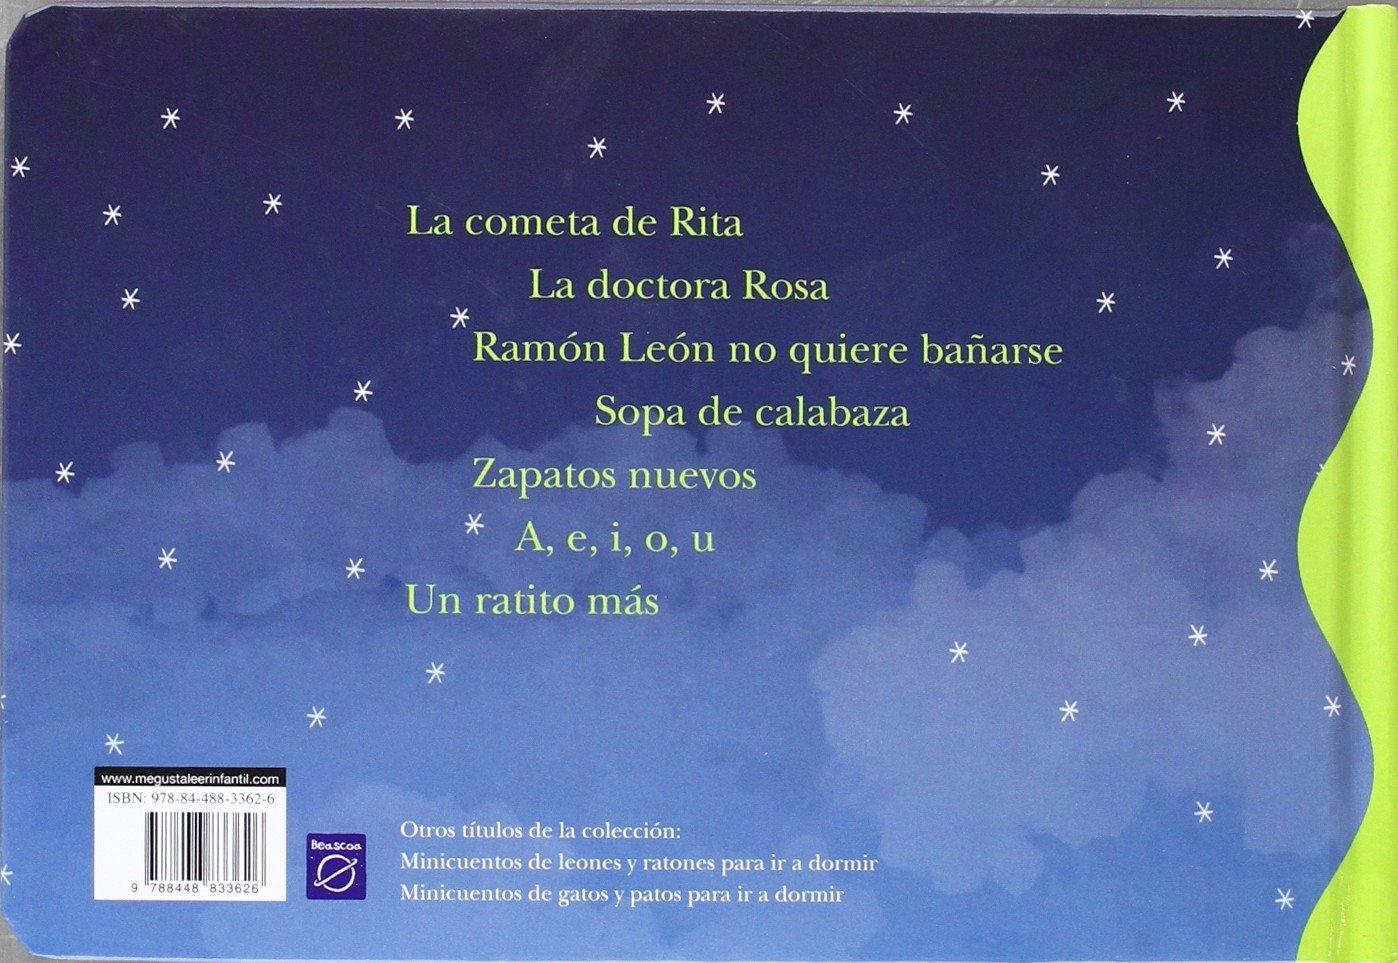 Minicuentos de leones y ratones para ir a dormir / Mini Bedtime Stories of Lions and Mice (Spanish Edition): Magela Ronda, Blanca Bk: 9788448833626: ...